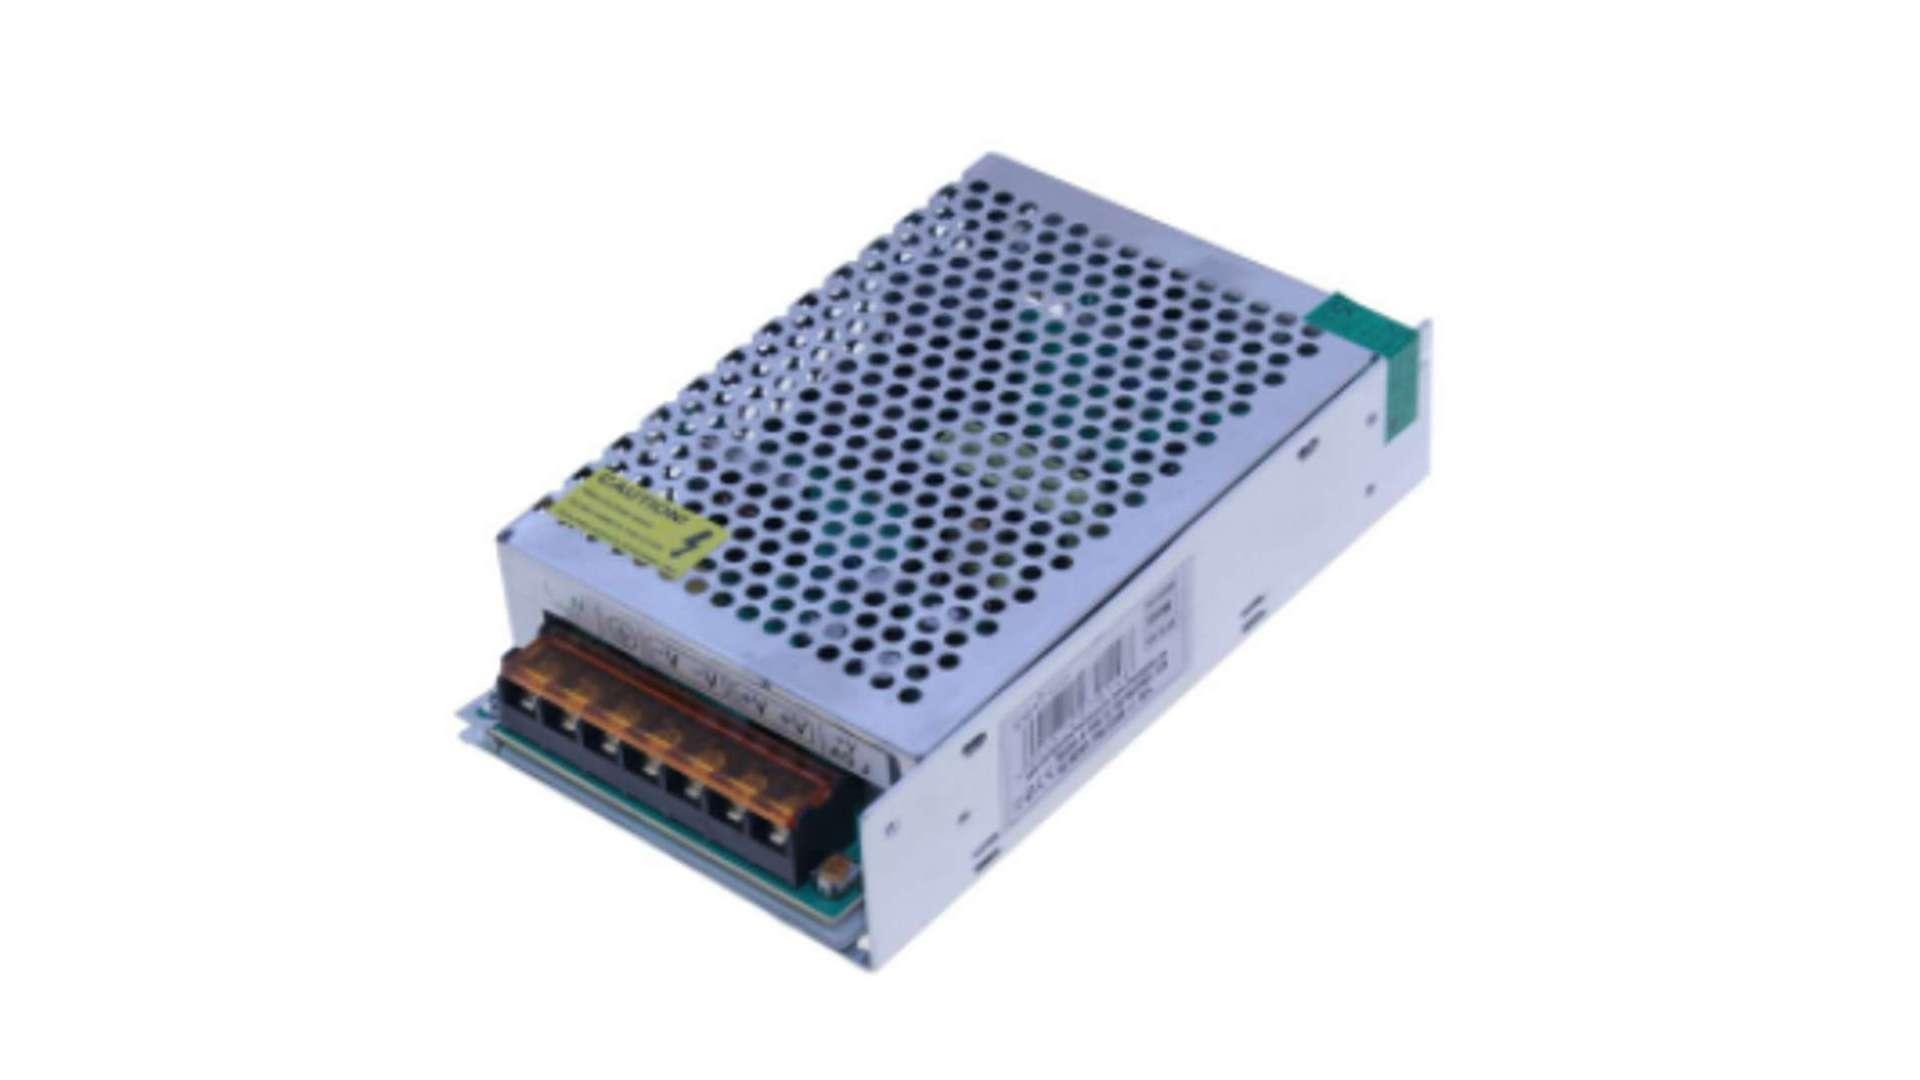 12V 200W IP20 enclosed power supply